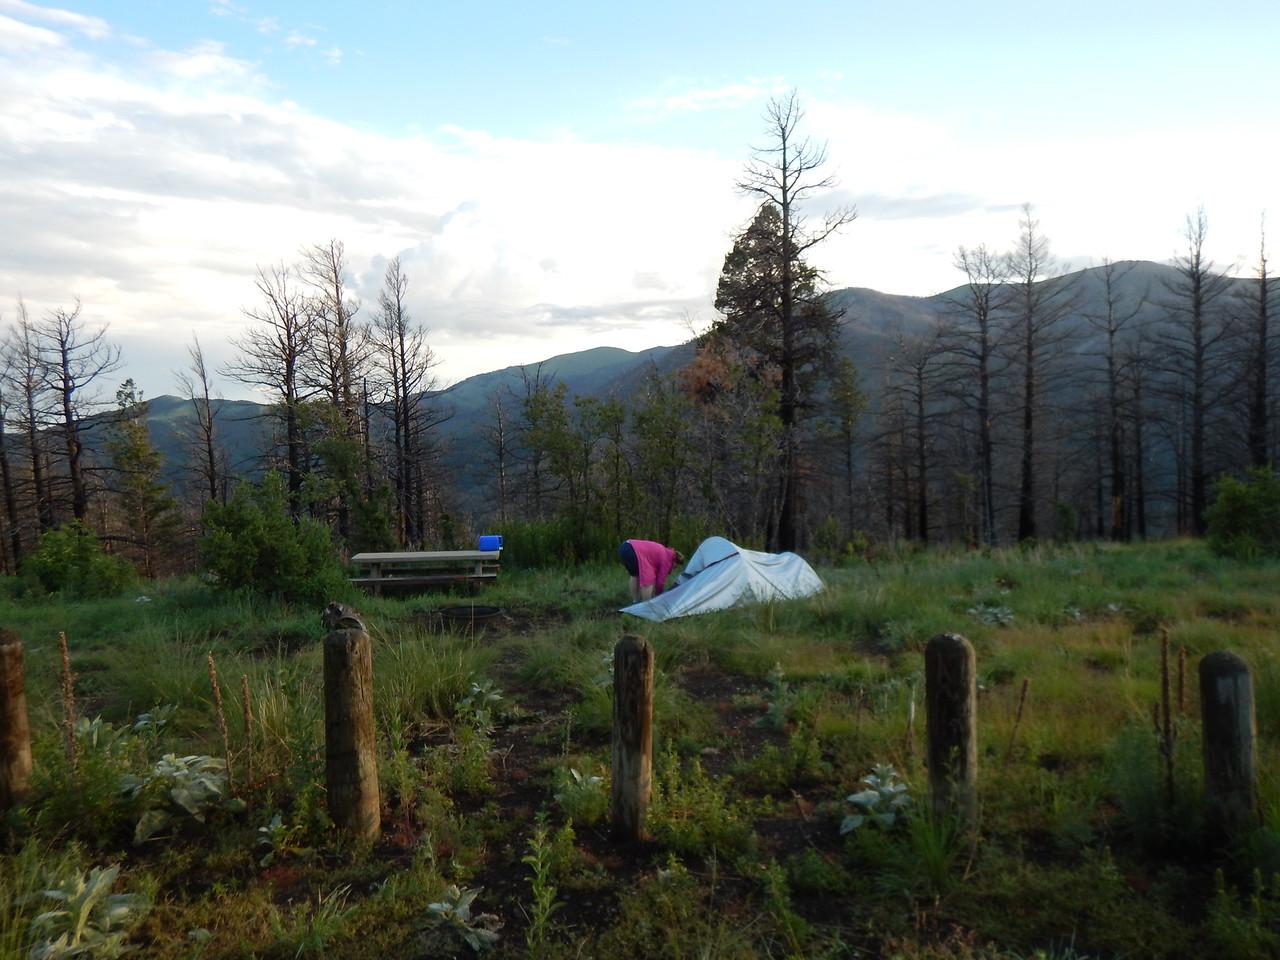 Skyline Campground